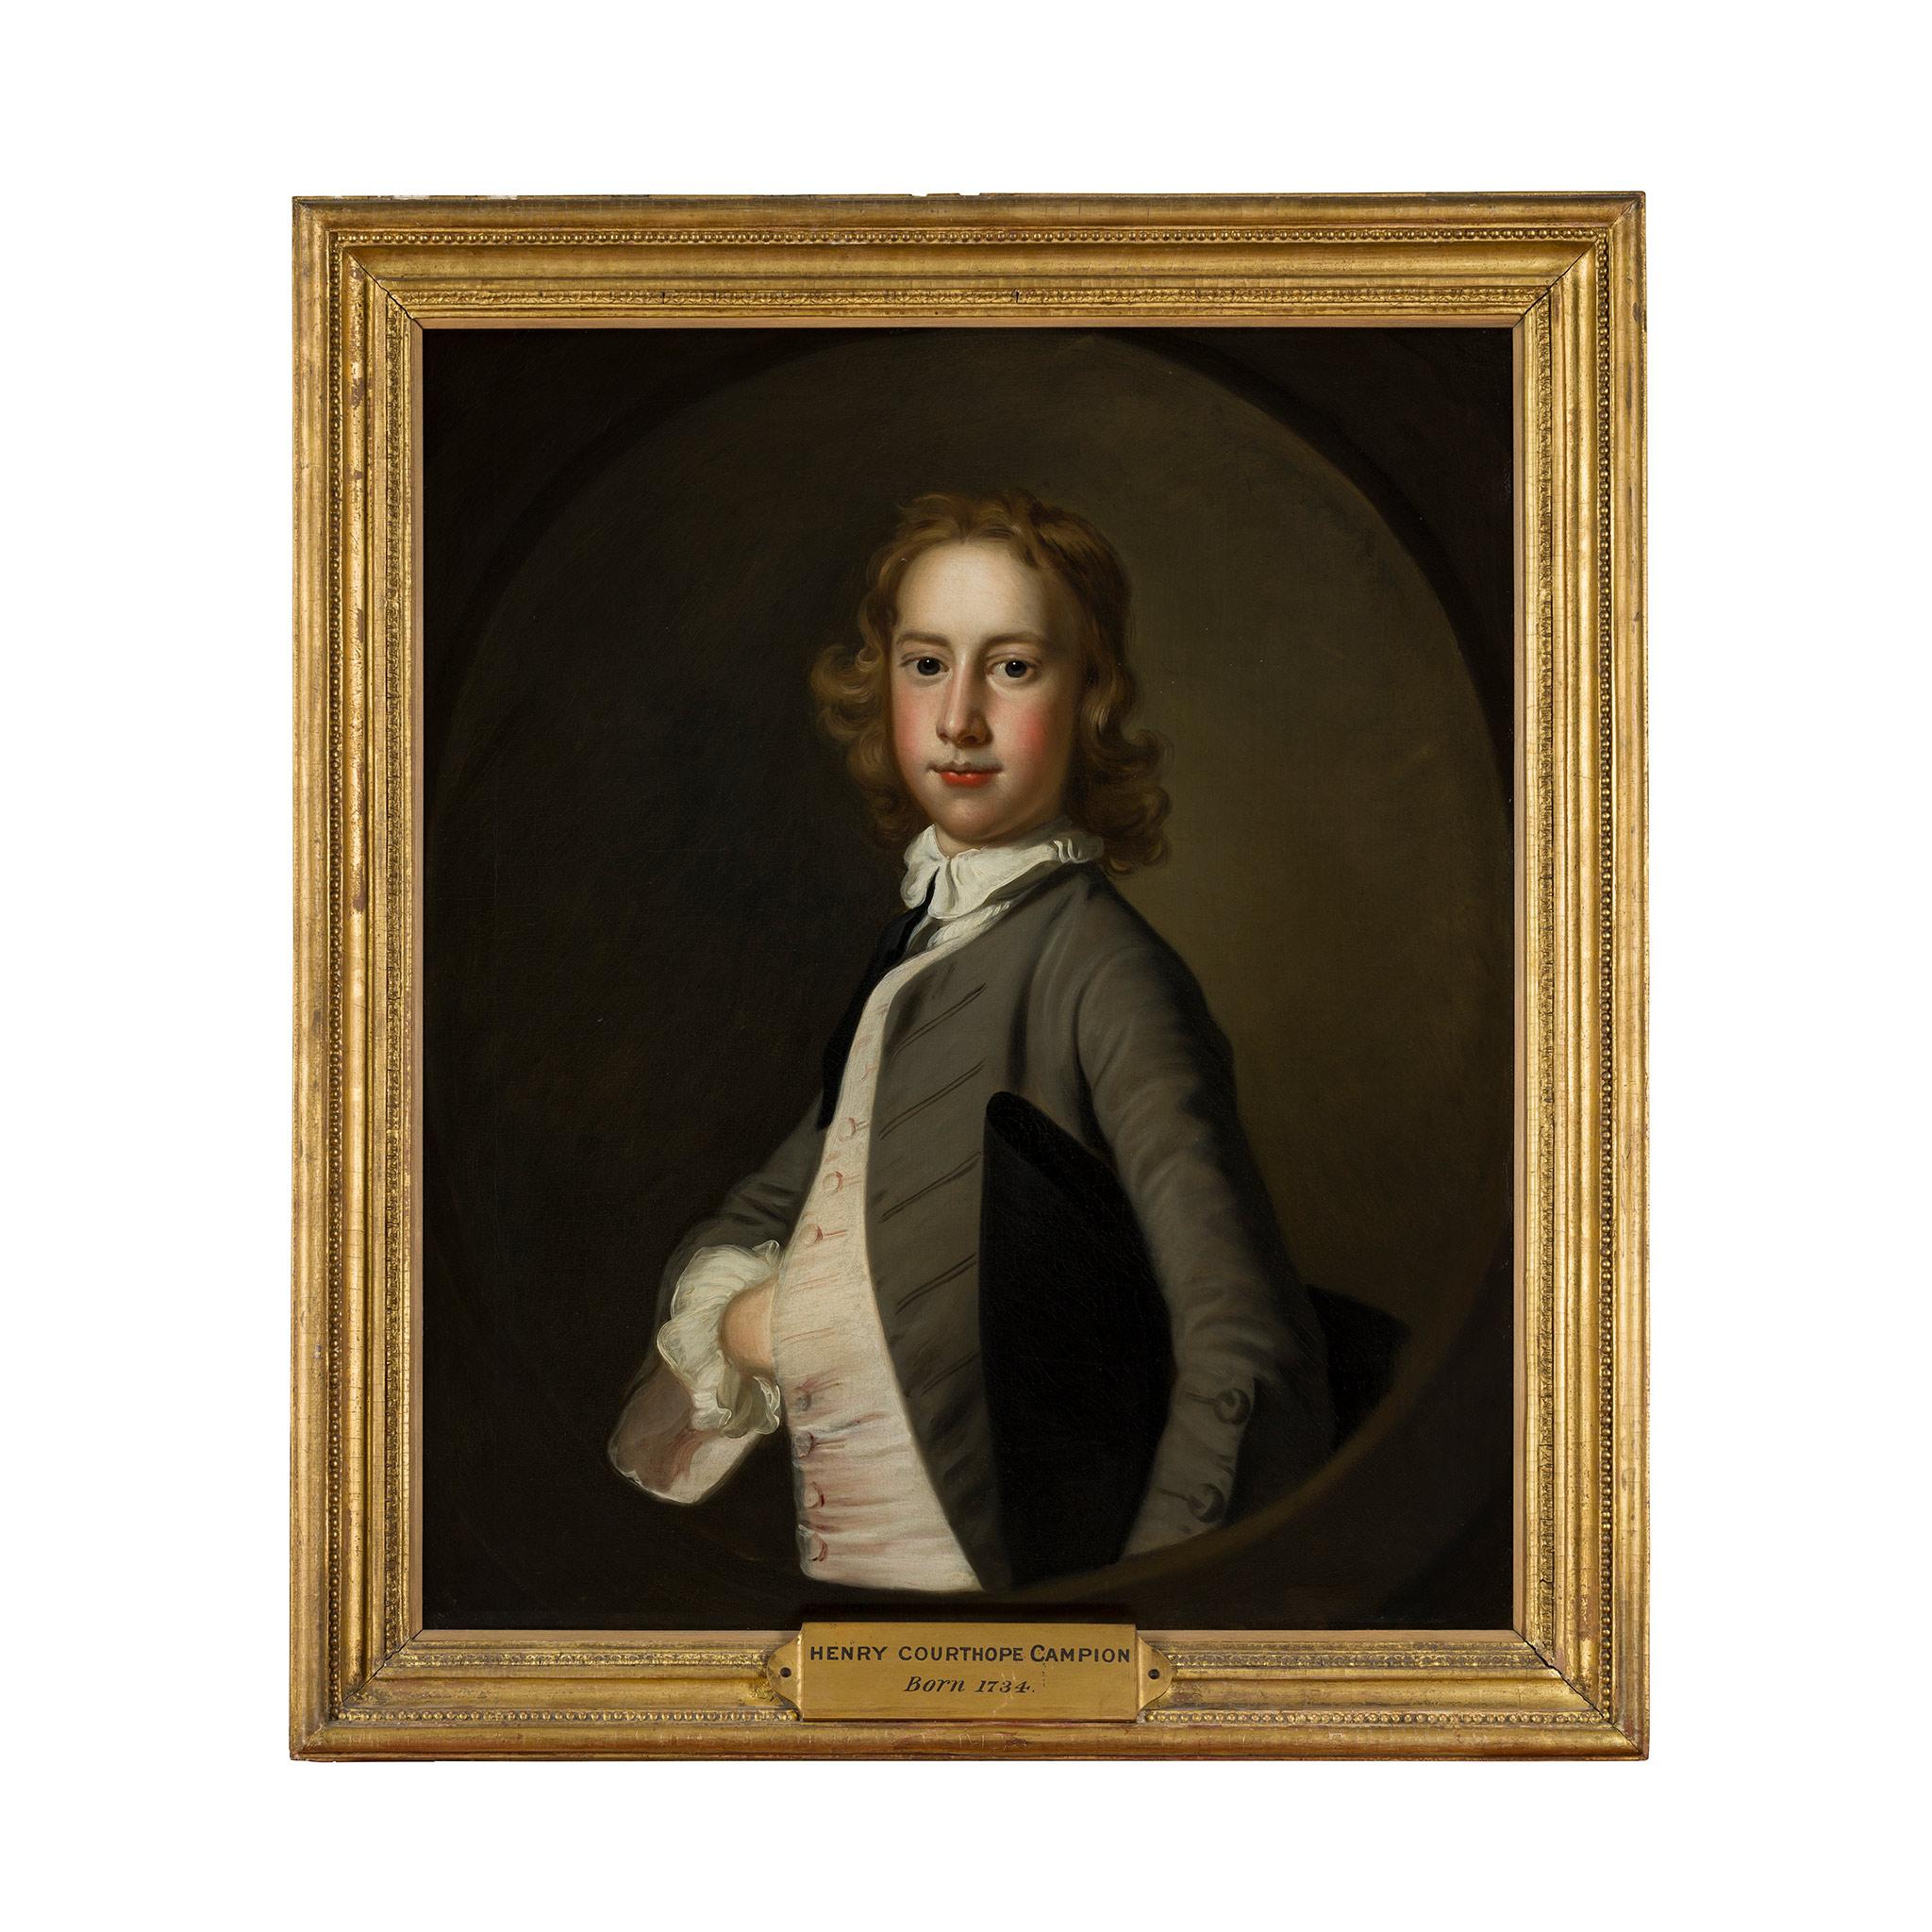 THOMAS HUDSON (BRITISH 1701-1779) HALF LENGTH PORTRAIT OF HENRY COURTHOPE CAMPION OF DANNY B.1734 - Image 2 of 2